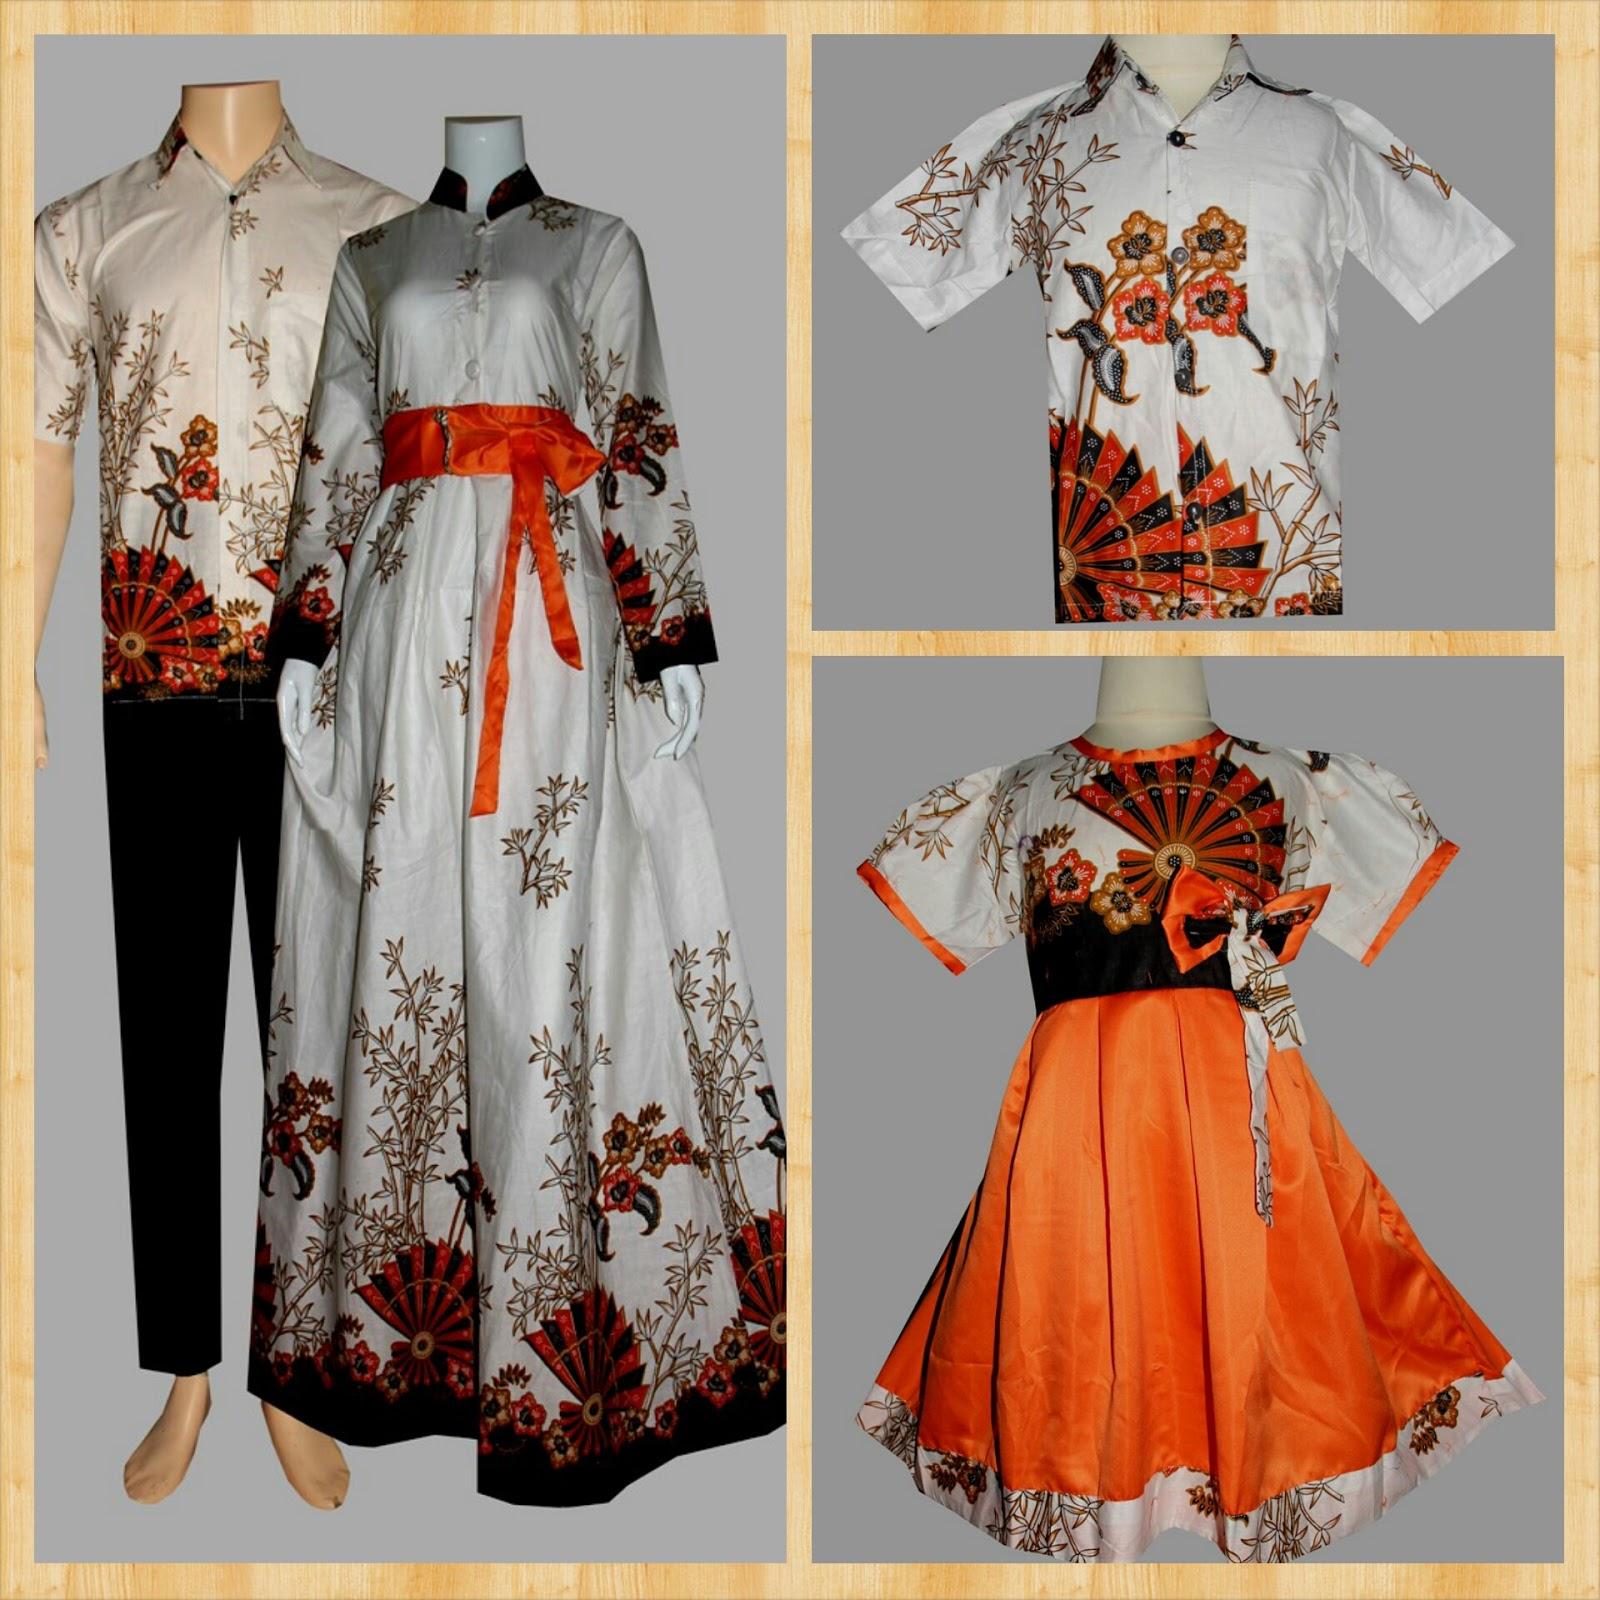 Jual Baju Keluarga Sarimbit Batik Family Couple Batik Gamis Batik